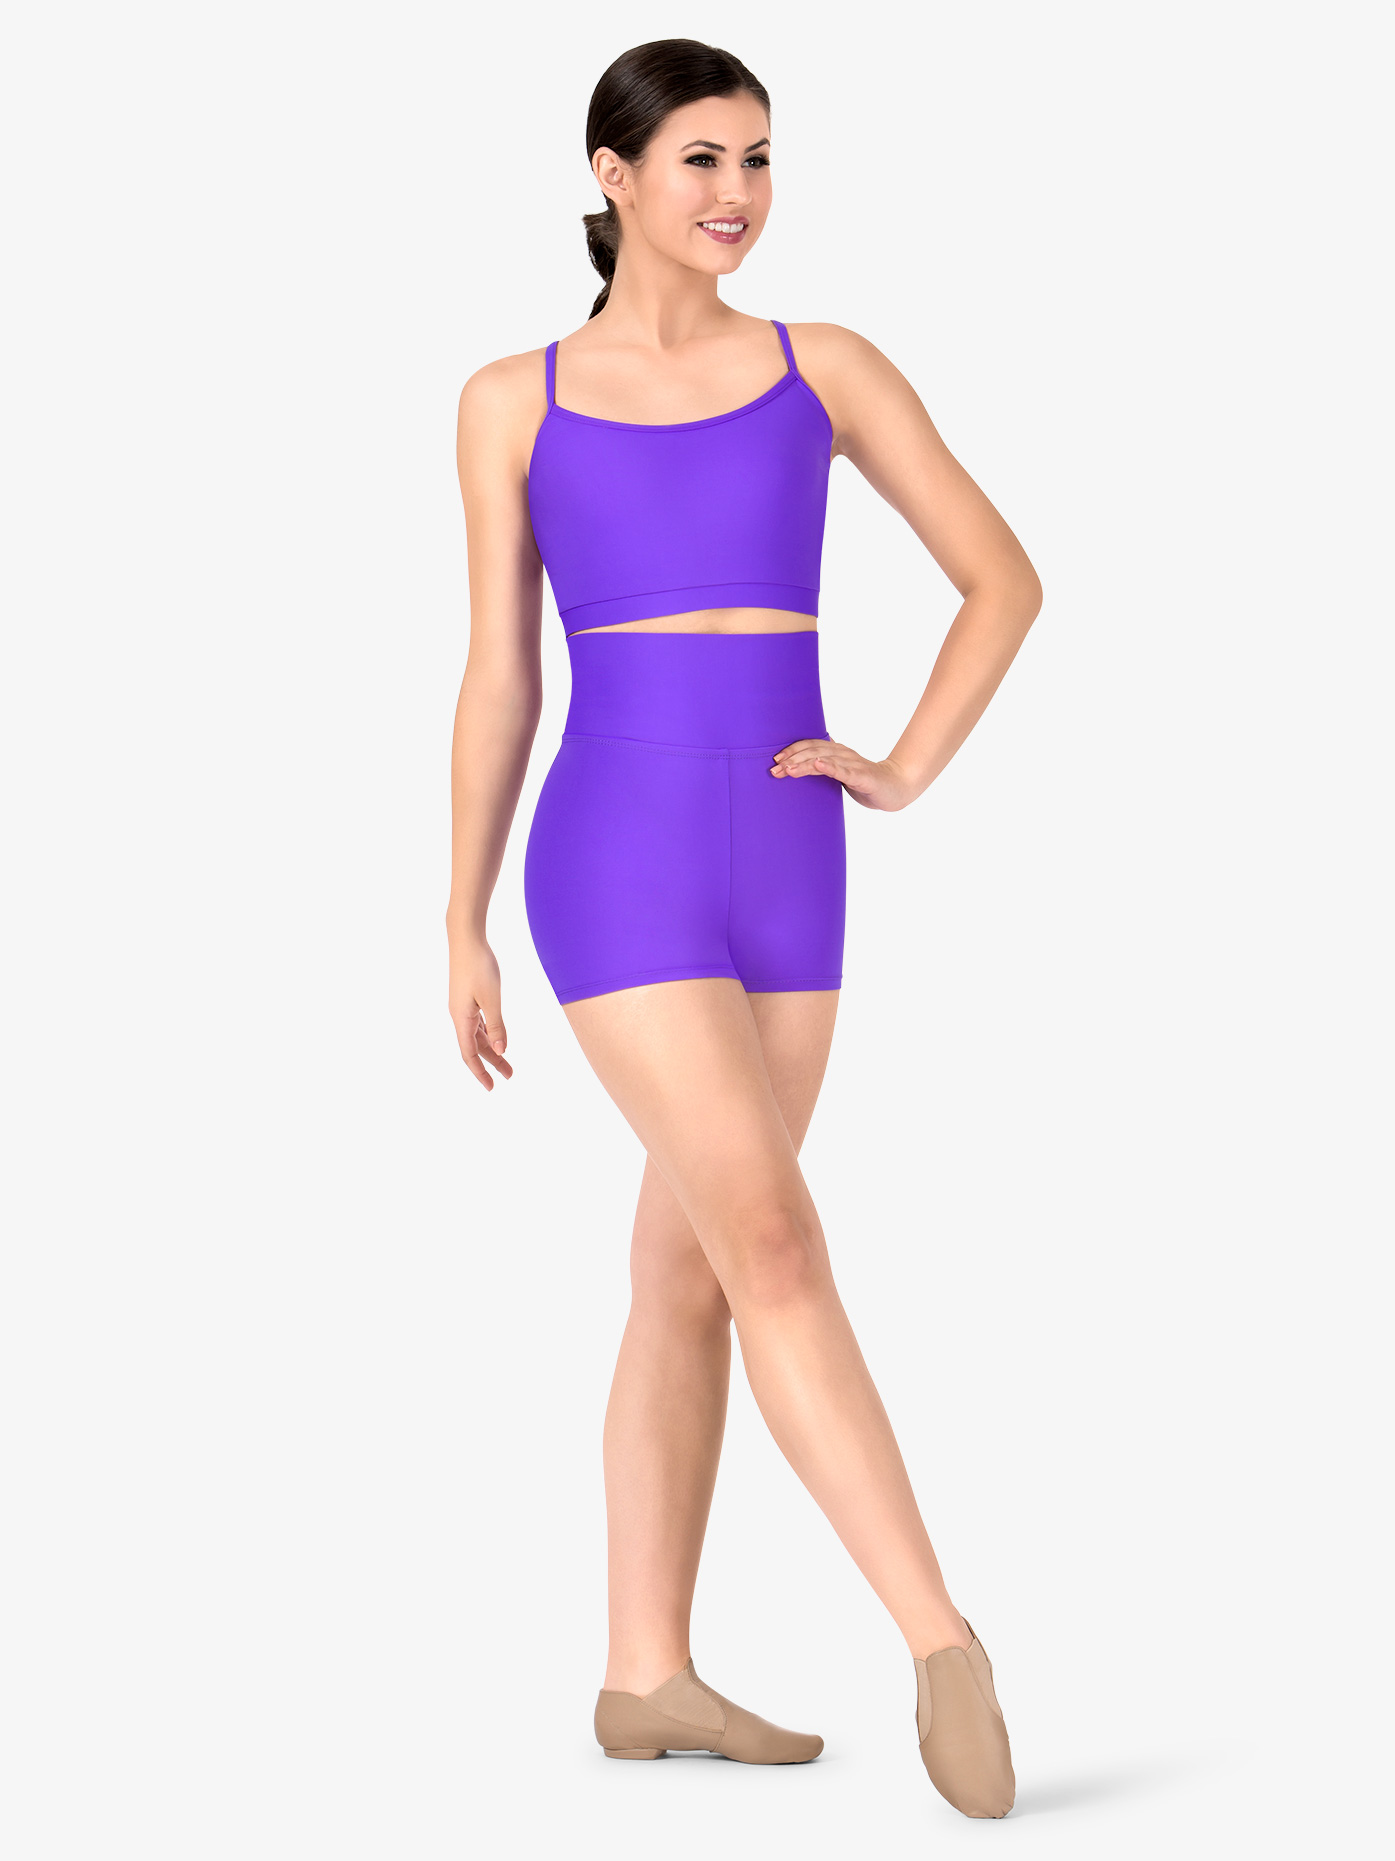 3ed41428c03 Womens Plus Size Team Basic Compression High Waist Dance Shorts - Style No  BT5205P. Loading zoom